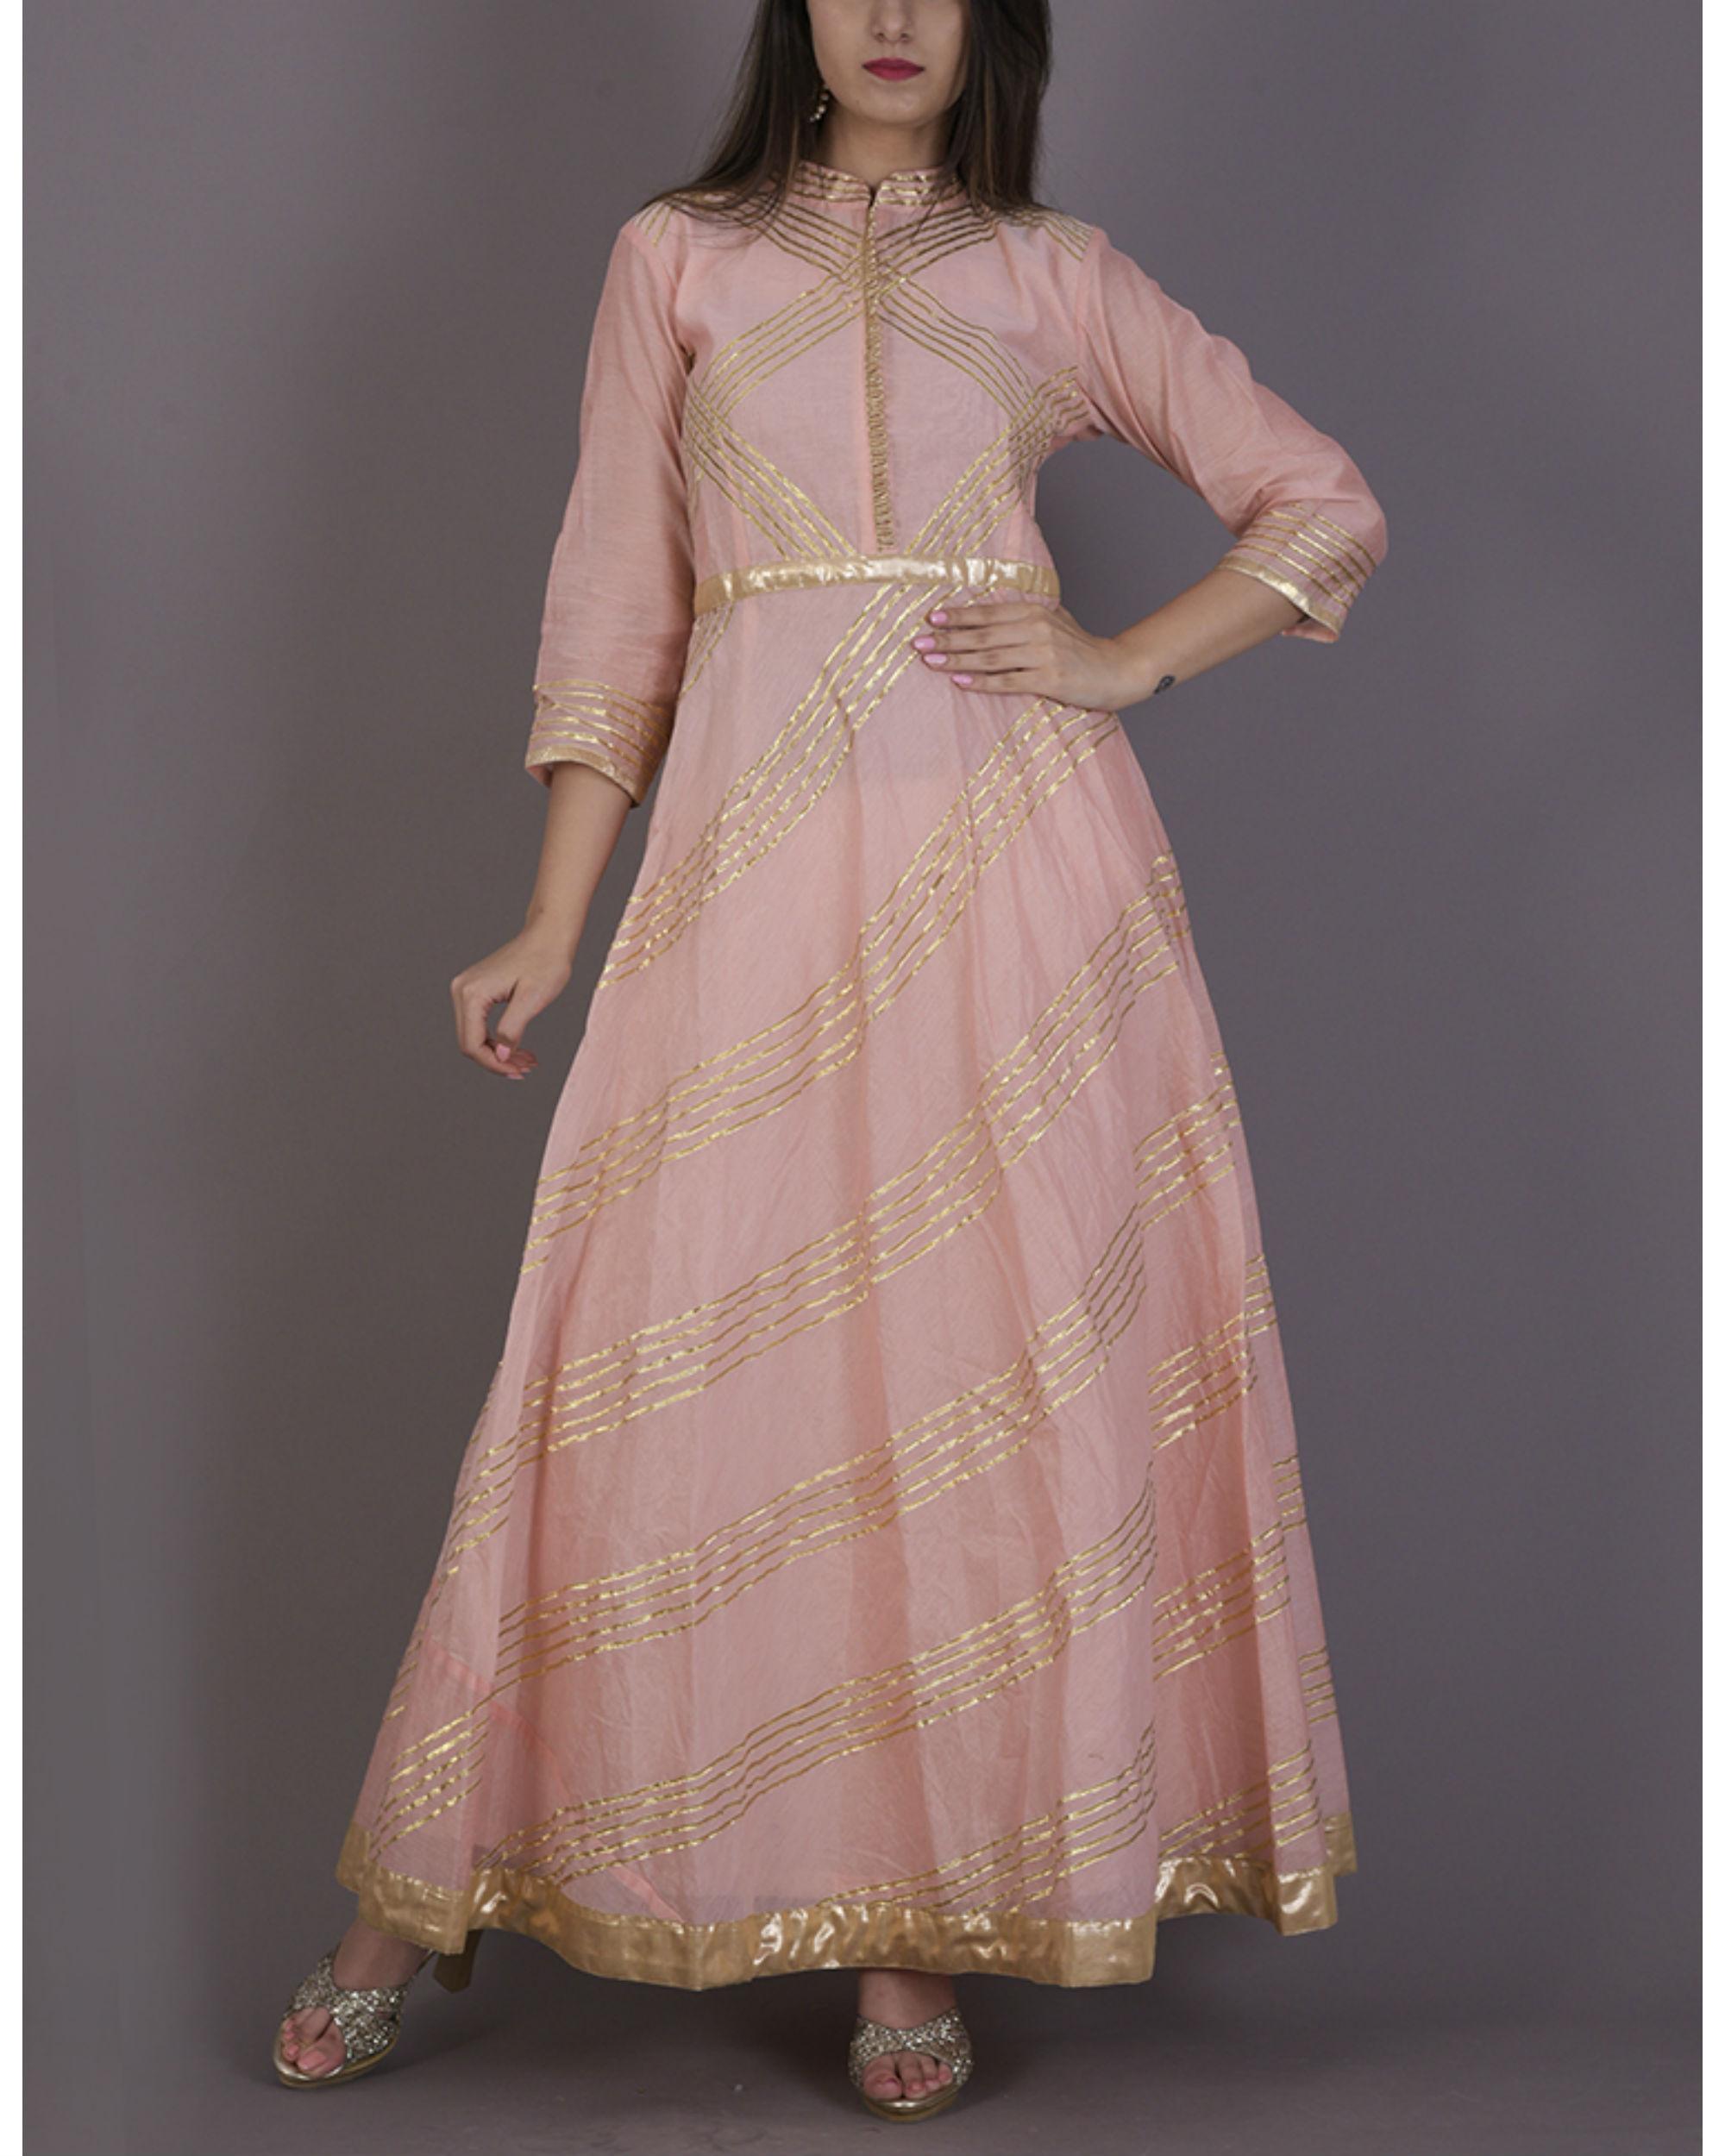 Peach gota dress